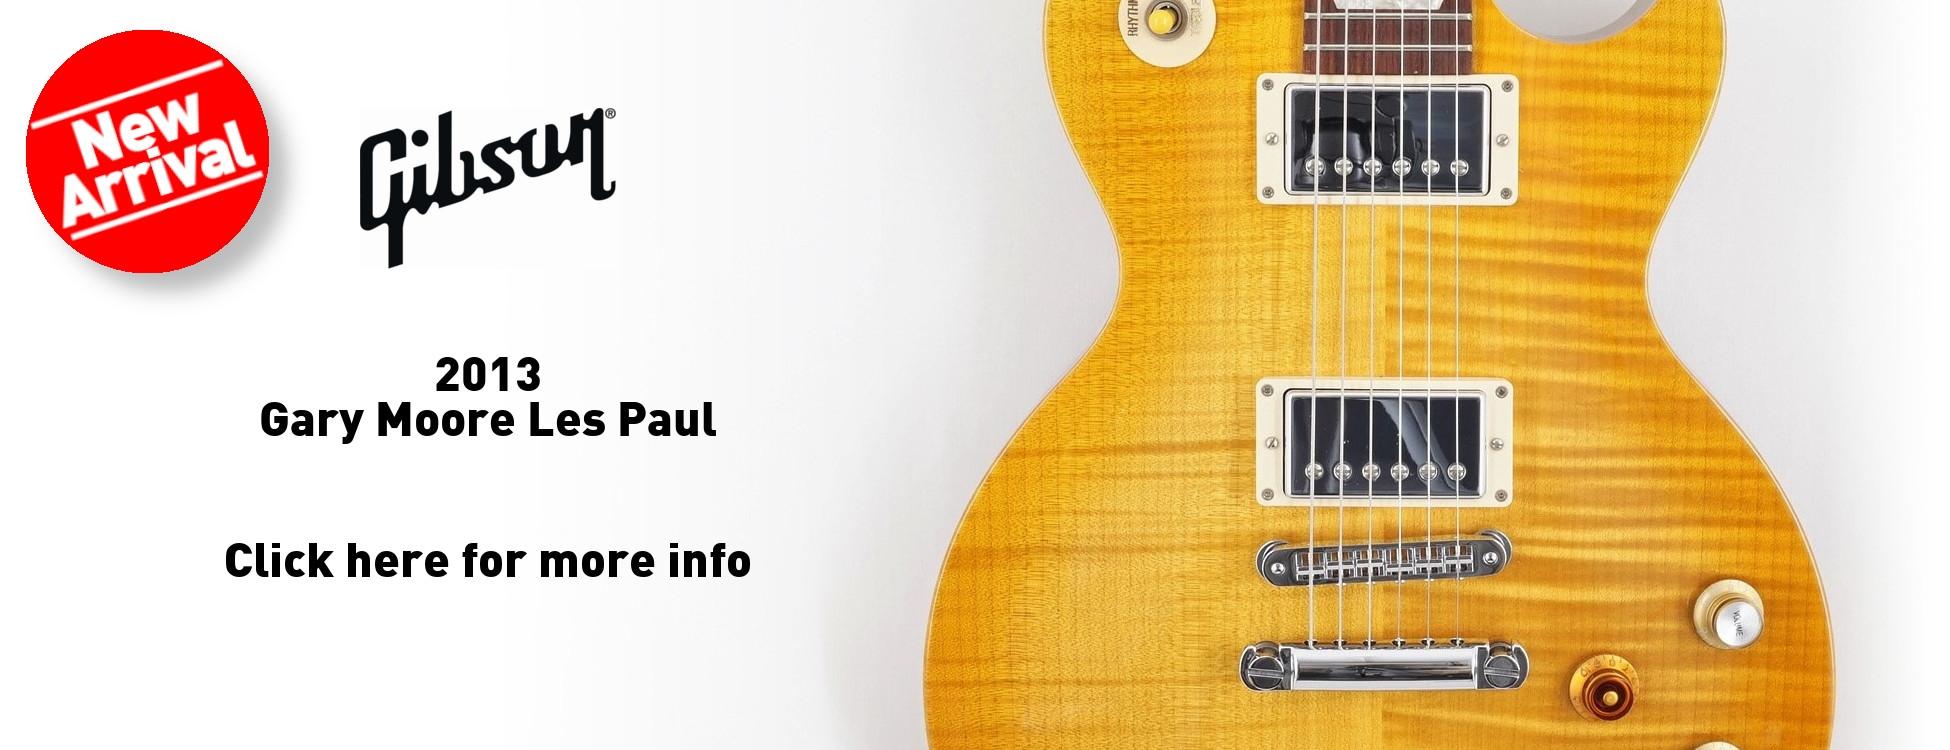 Gibson 2013 Gary Moore Les Paul